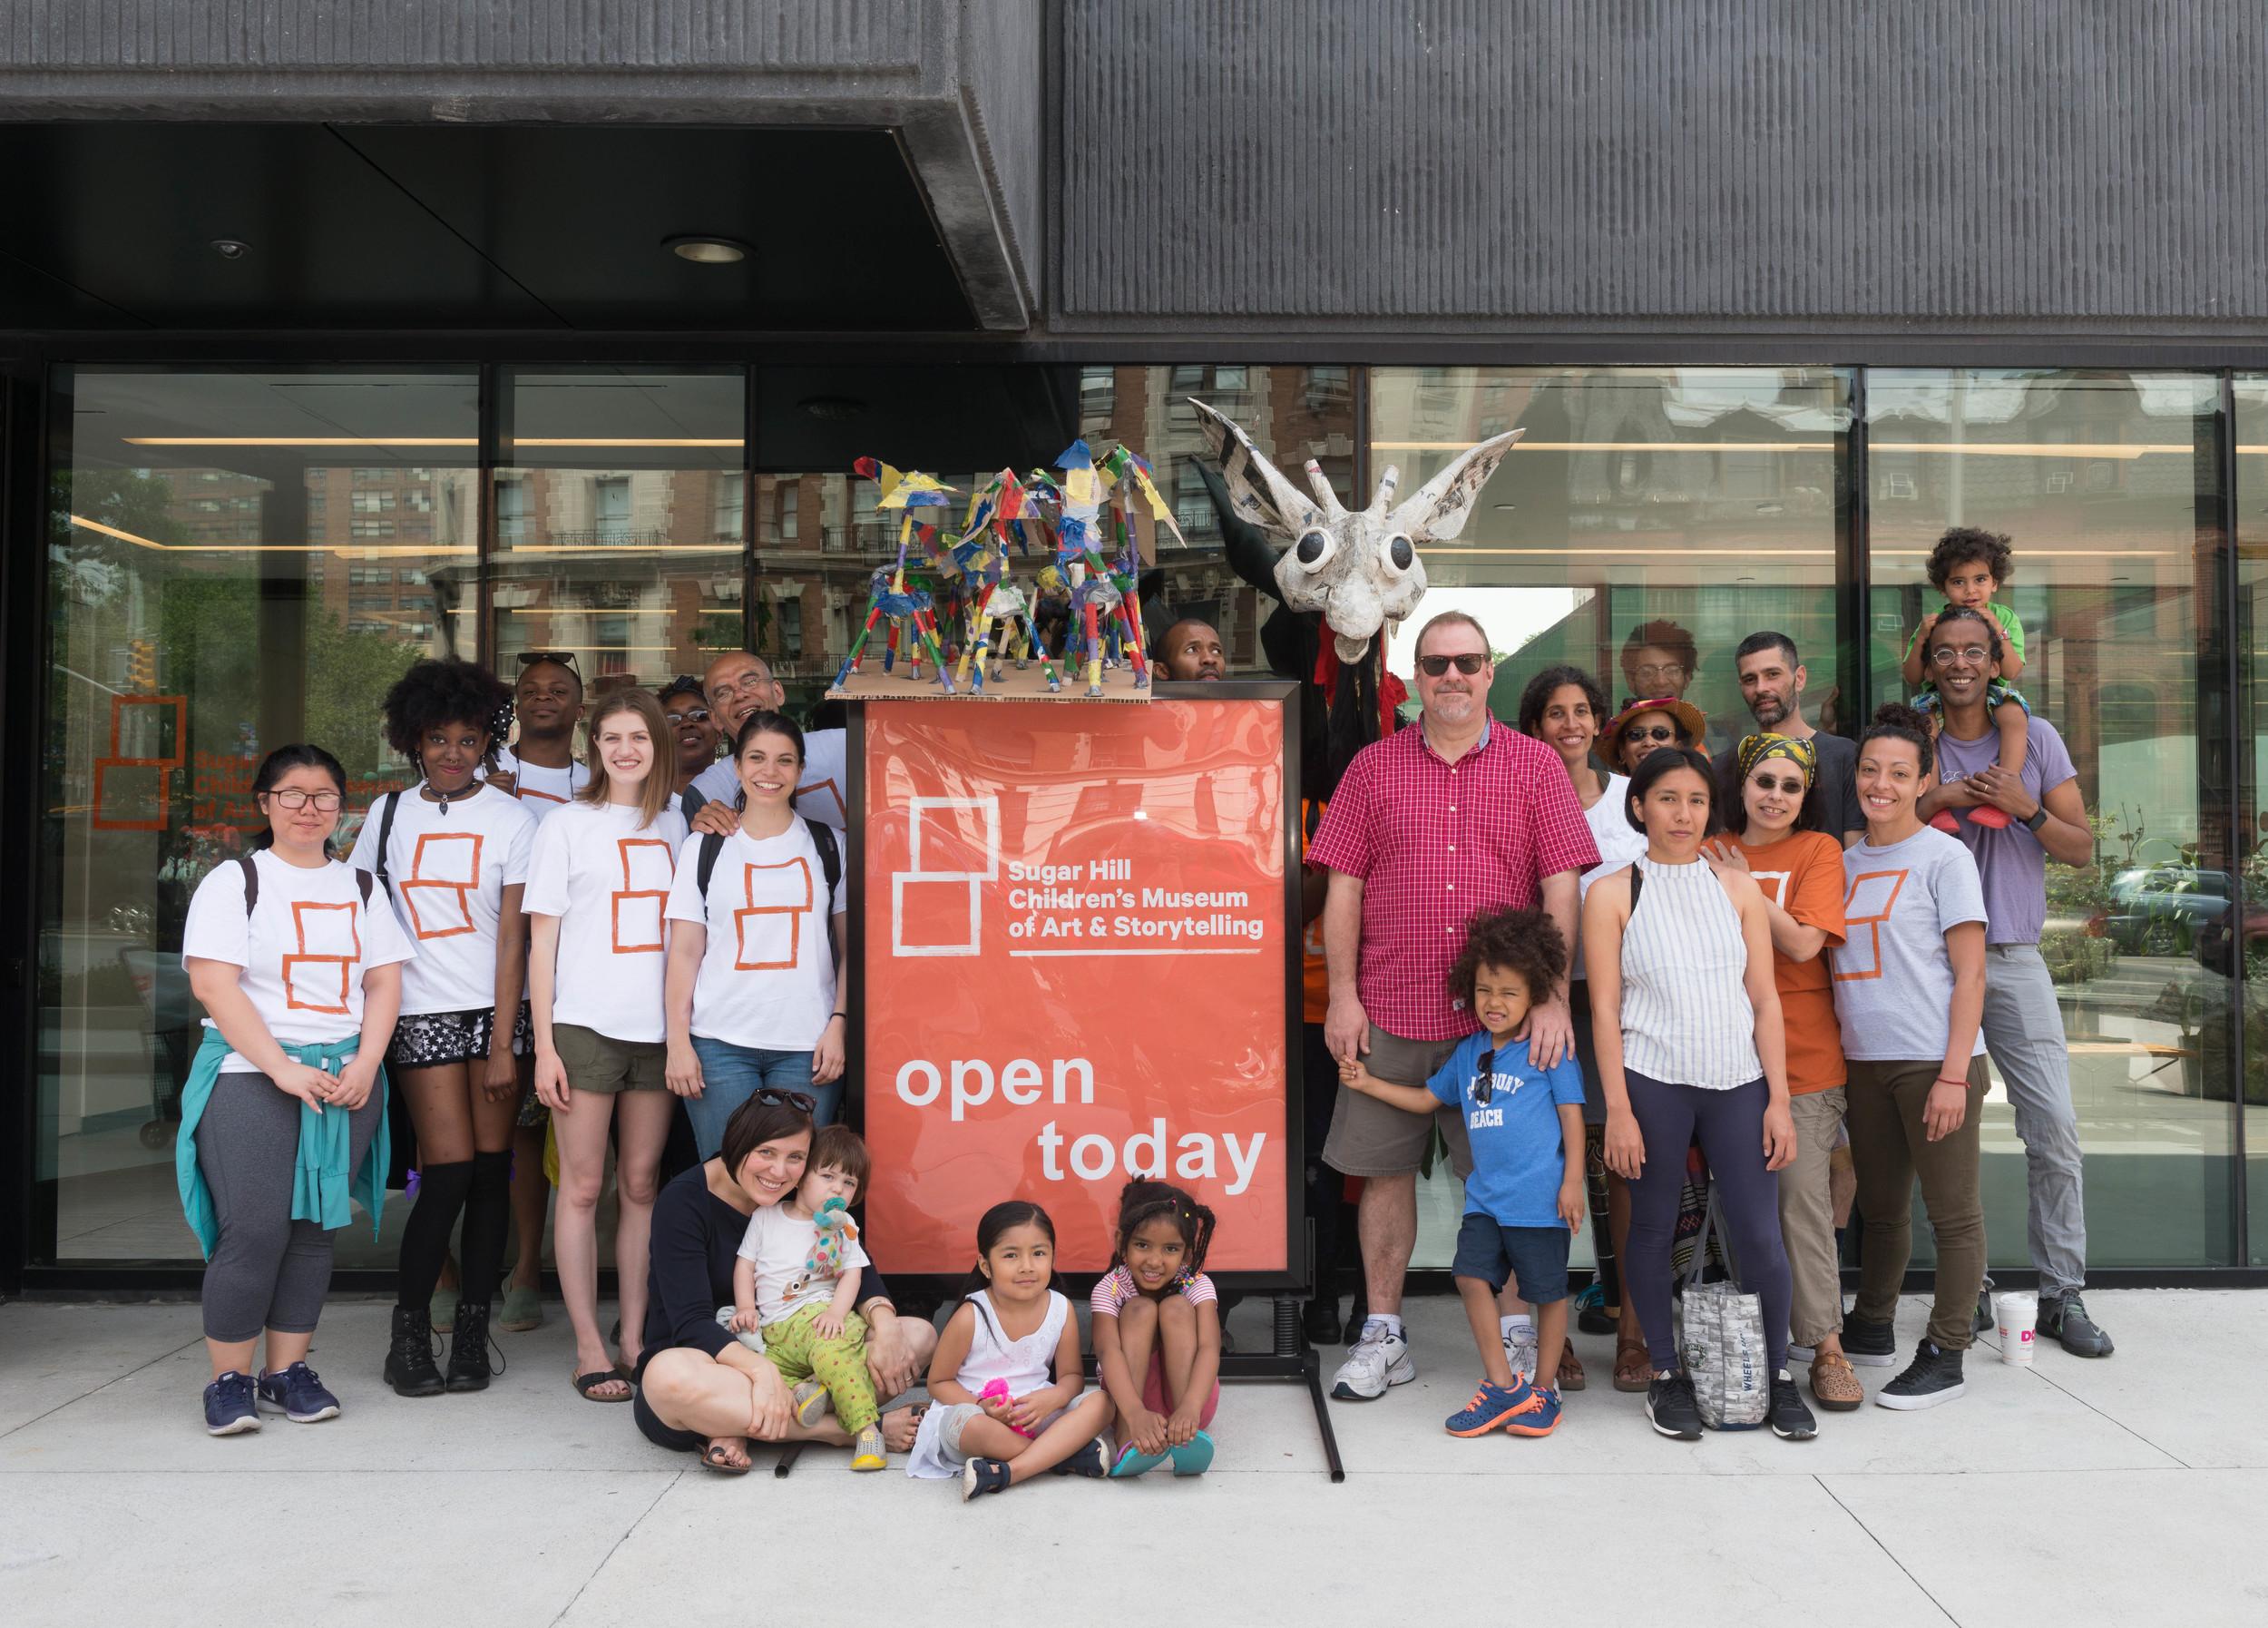 Hike the Heights/Giraffe Path 2016 kicks off at the Sugar Hill Children's Museum